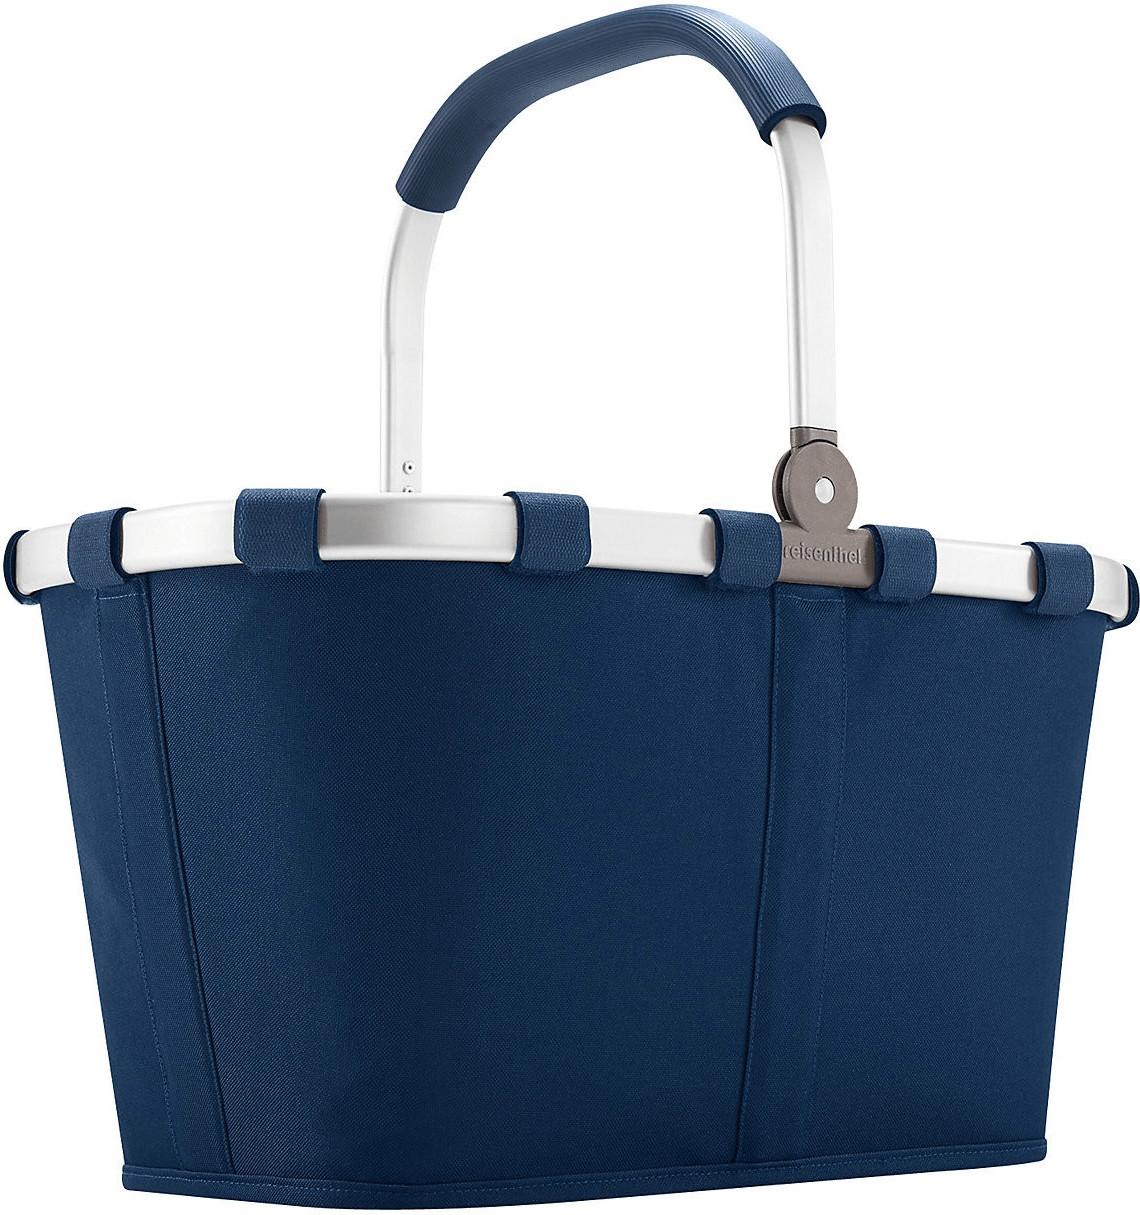 Reisenthel Carrybag dark blue